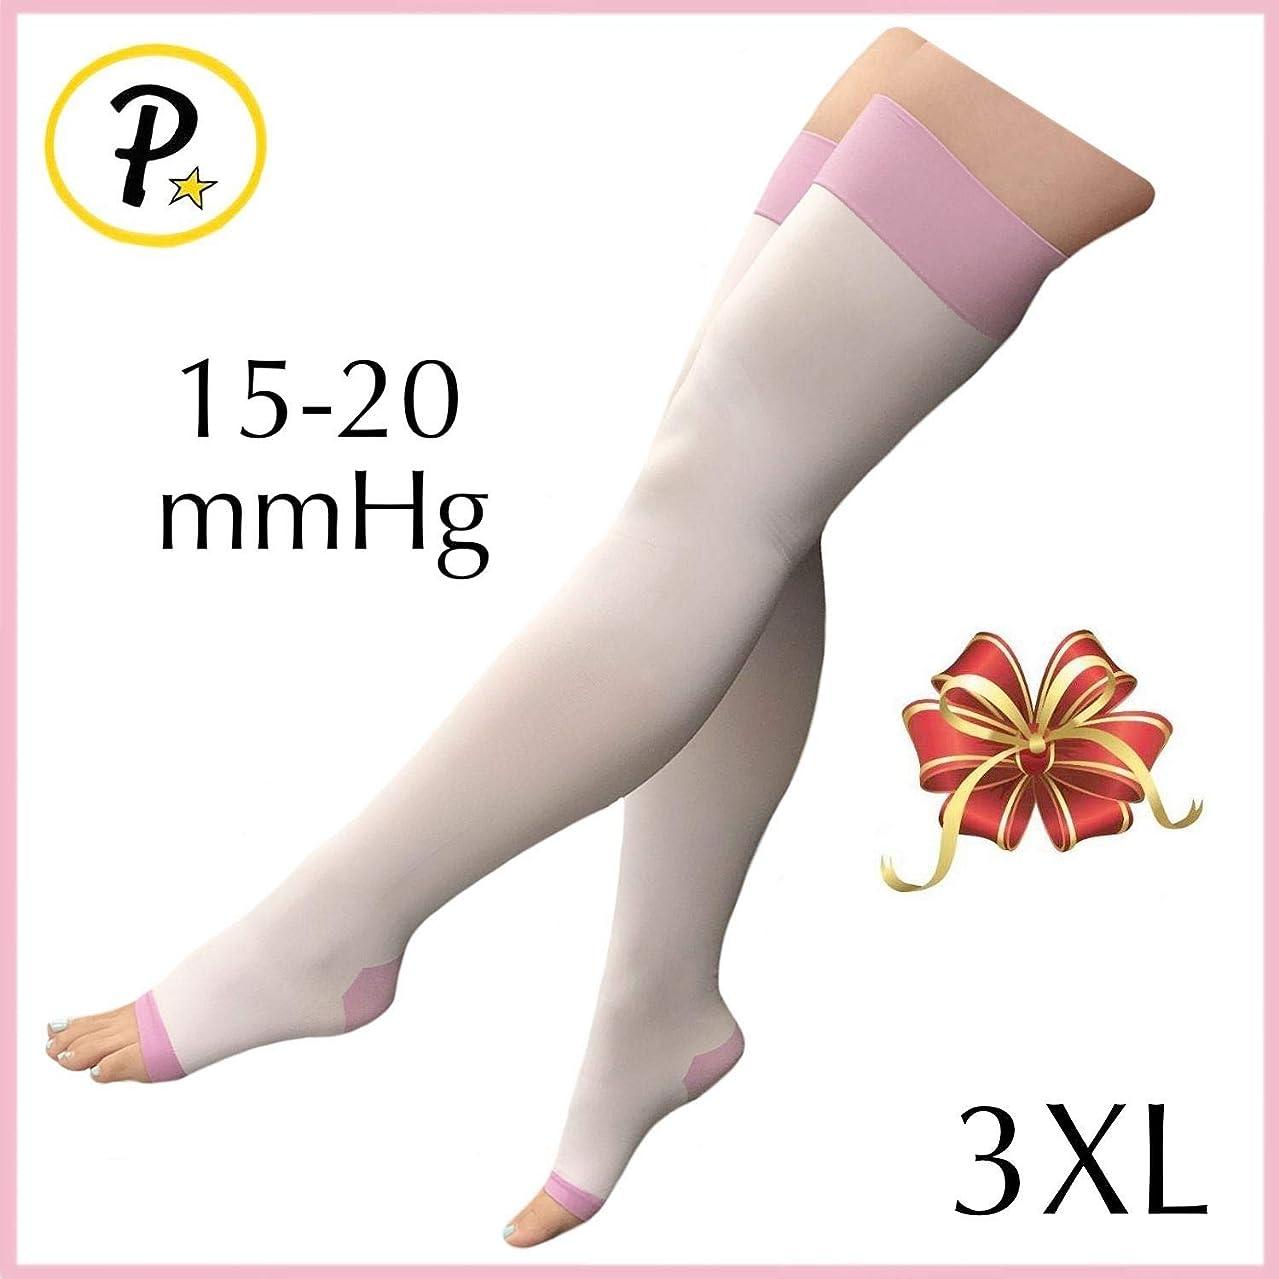 Presadee Women's Overnight Thigh High 15-20 mmHg Compression Slimming Plus Size Wide Big Leg Legging Open Toe Purple Stocking (3XL)